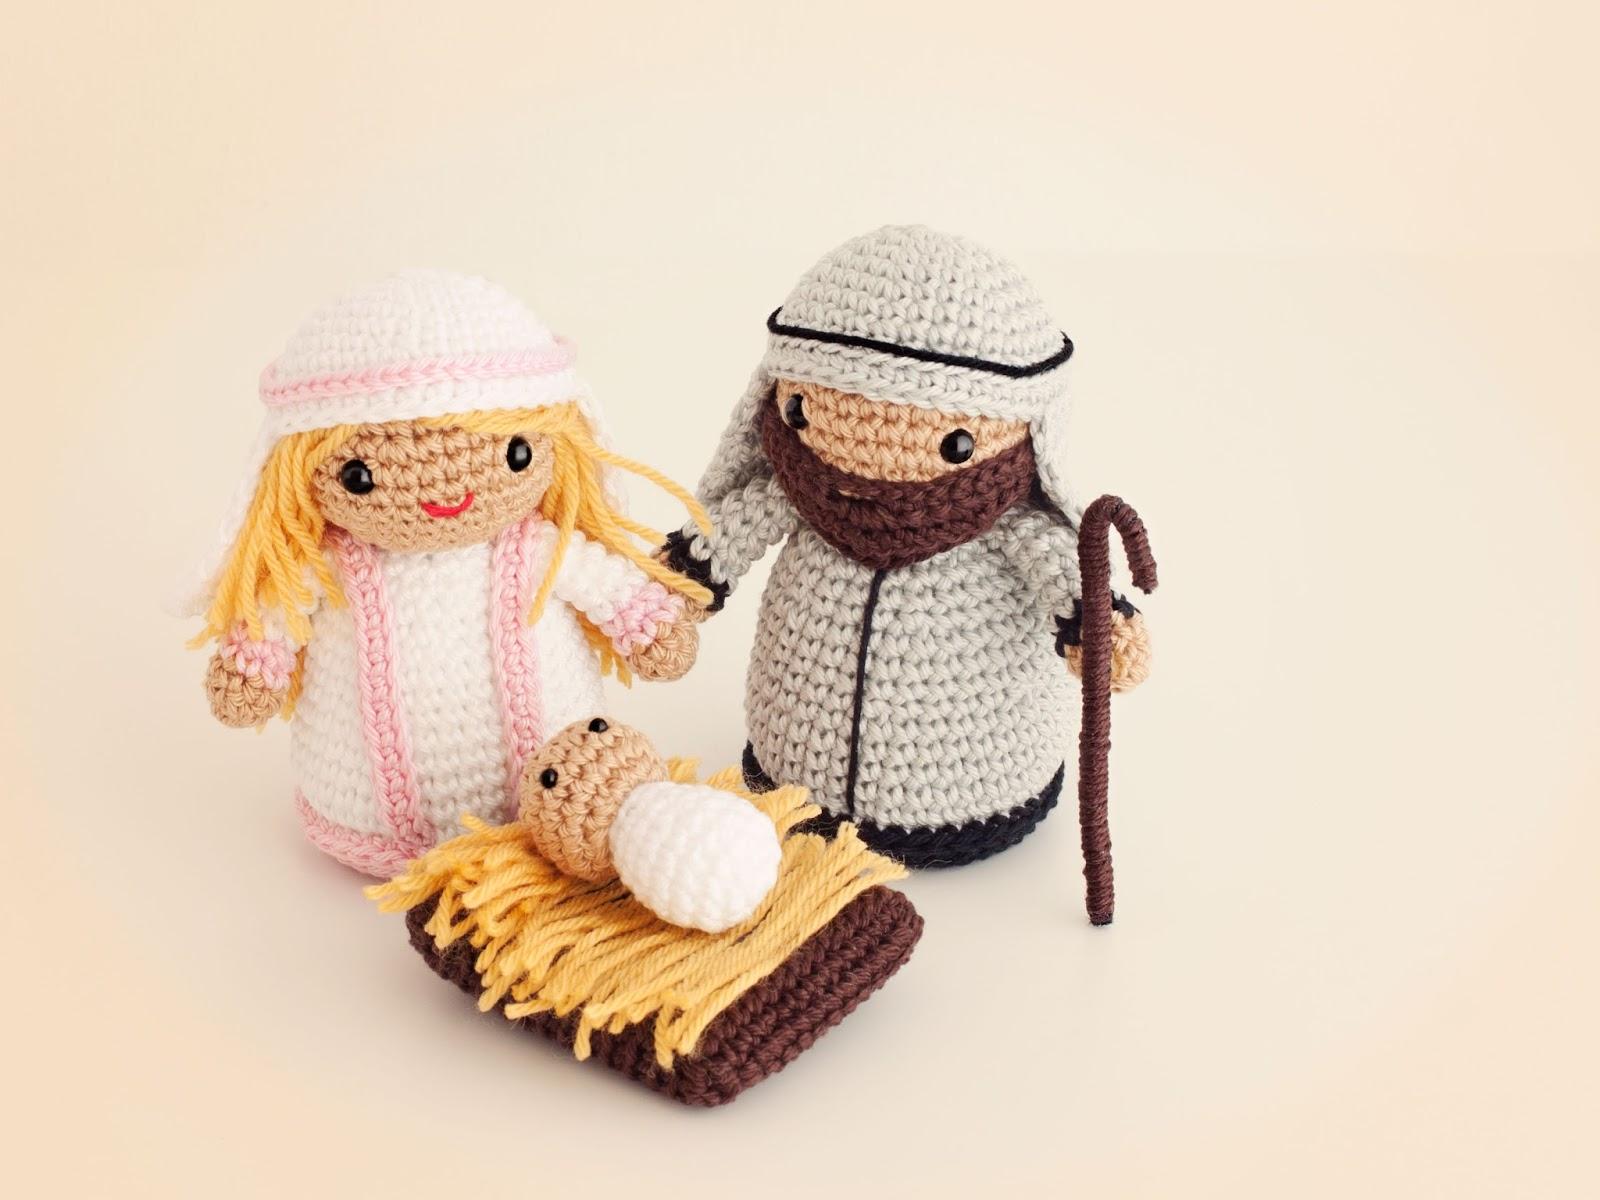 amigurumi-nacimiento-belen-nativity-patron-pattern